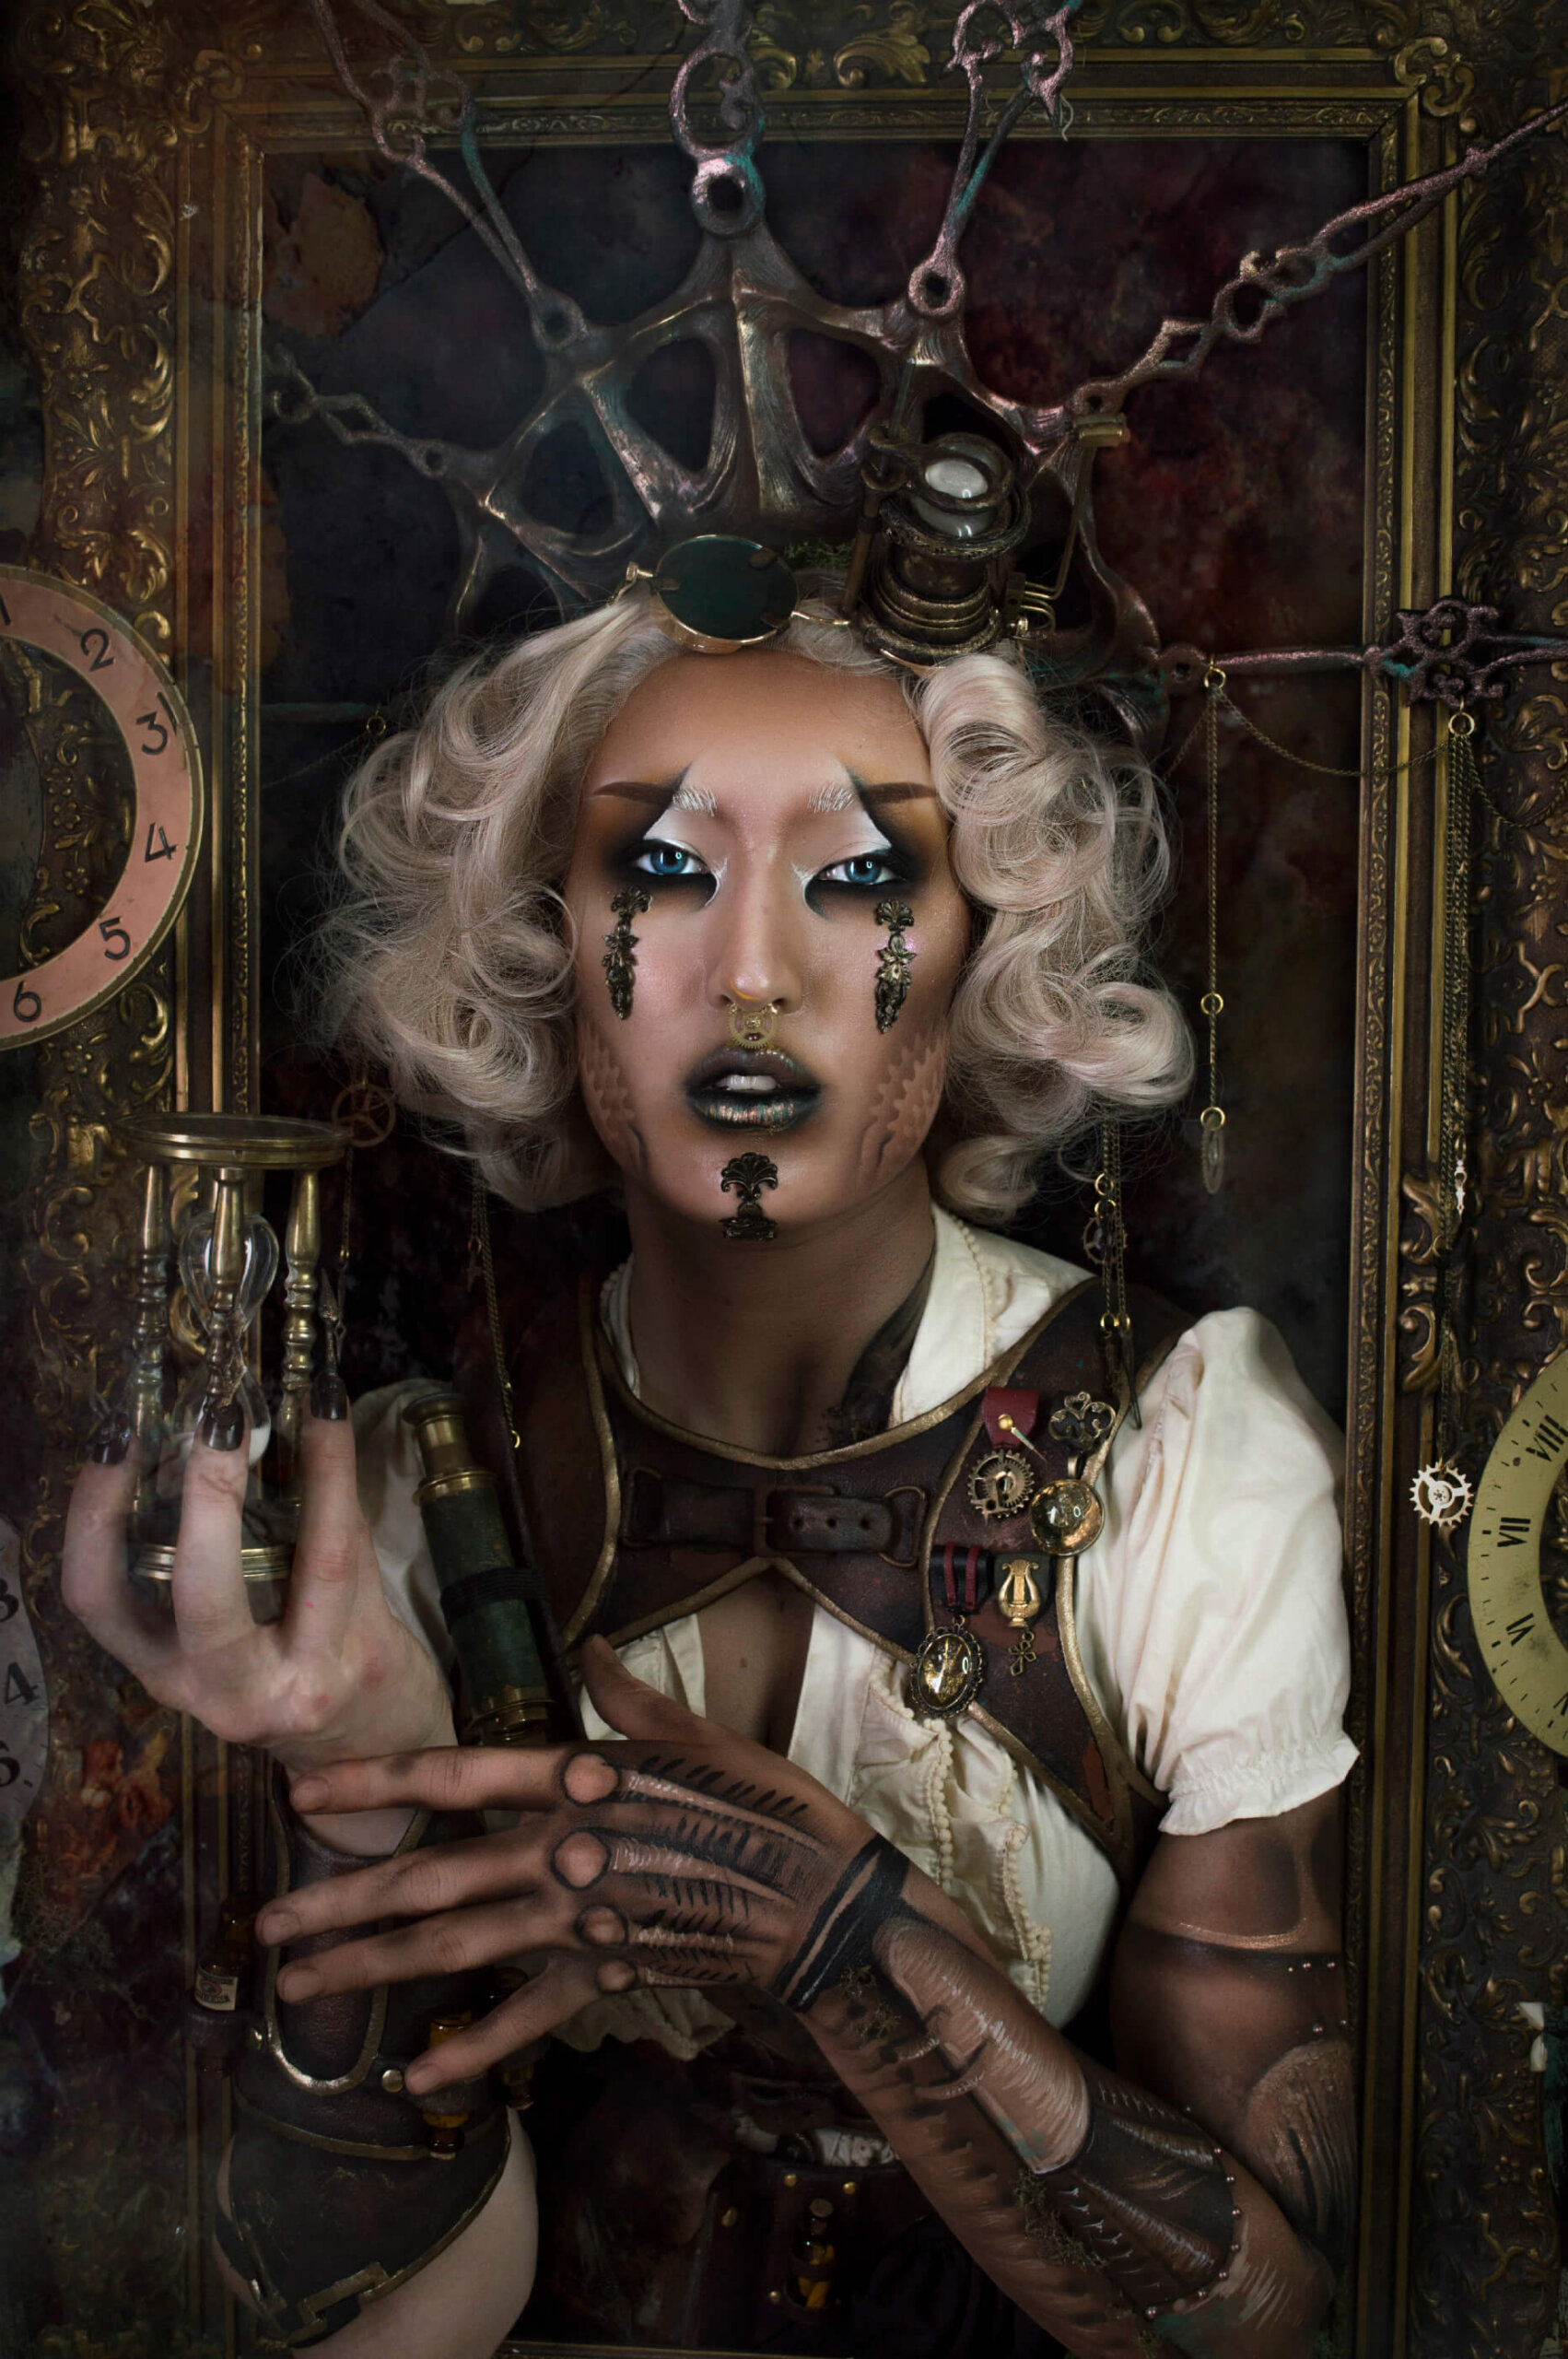 steampunk costume - candy makeup artist